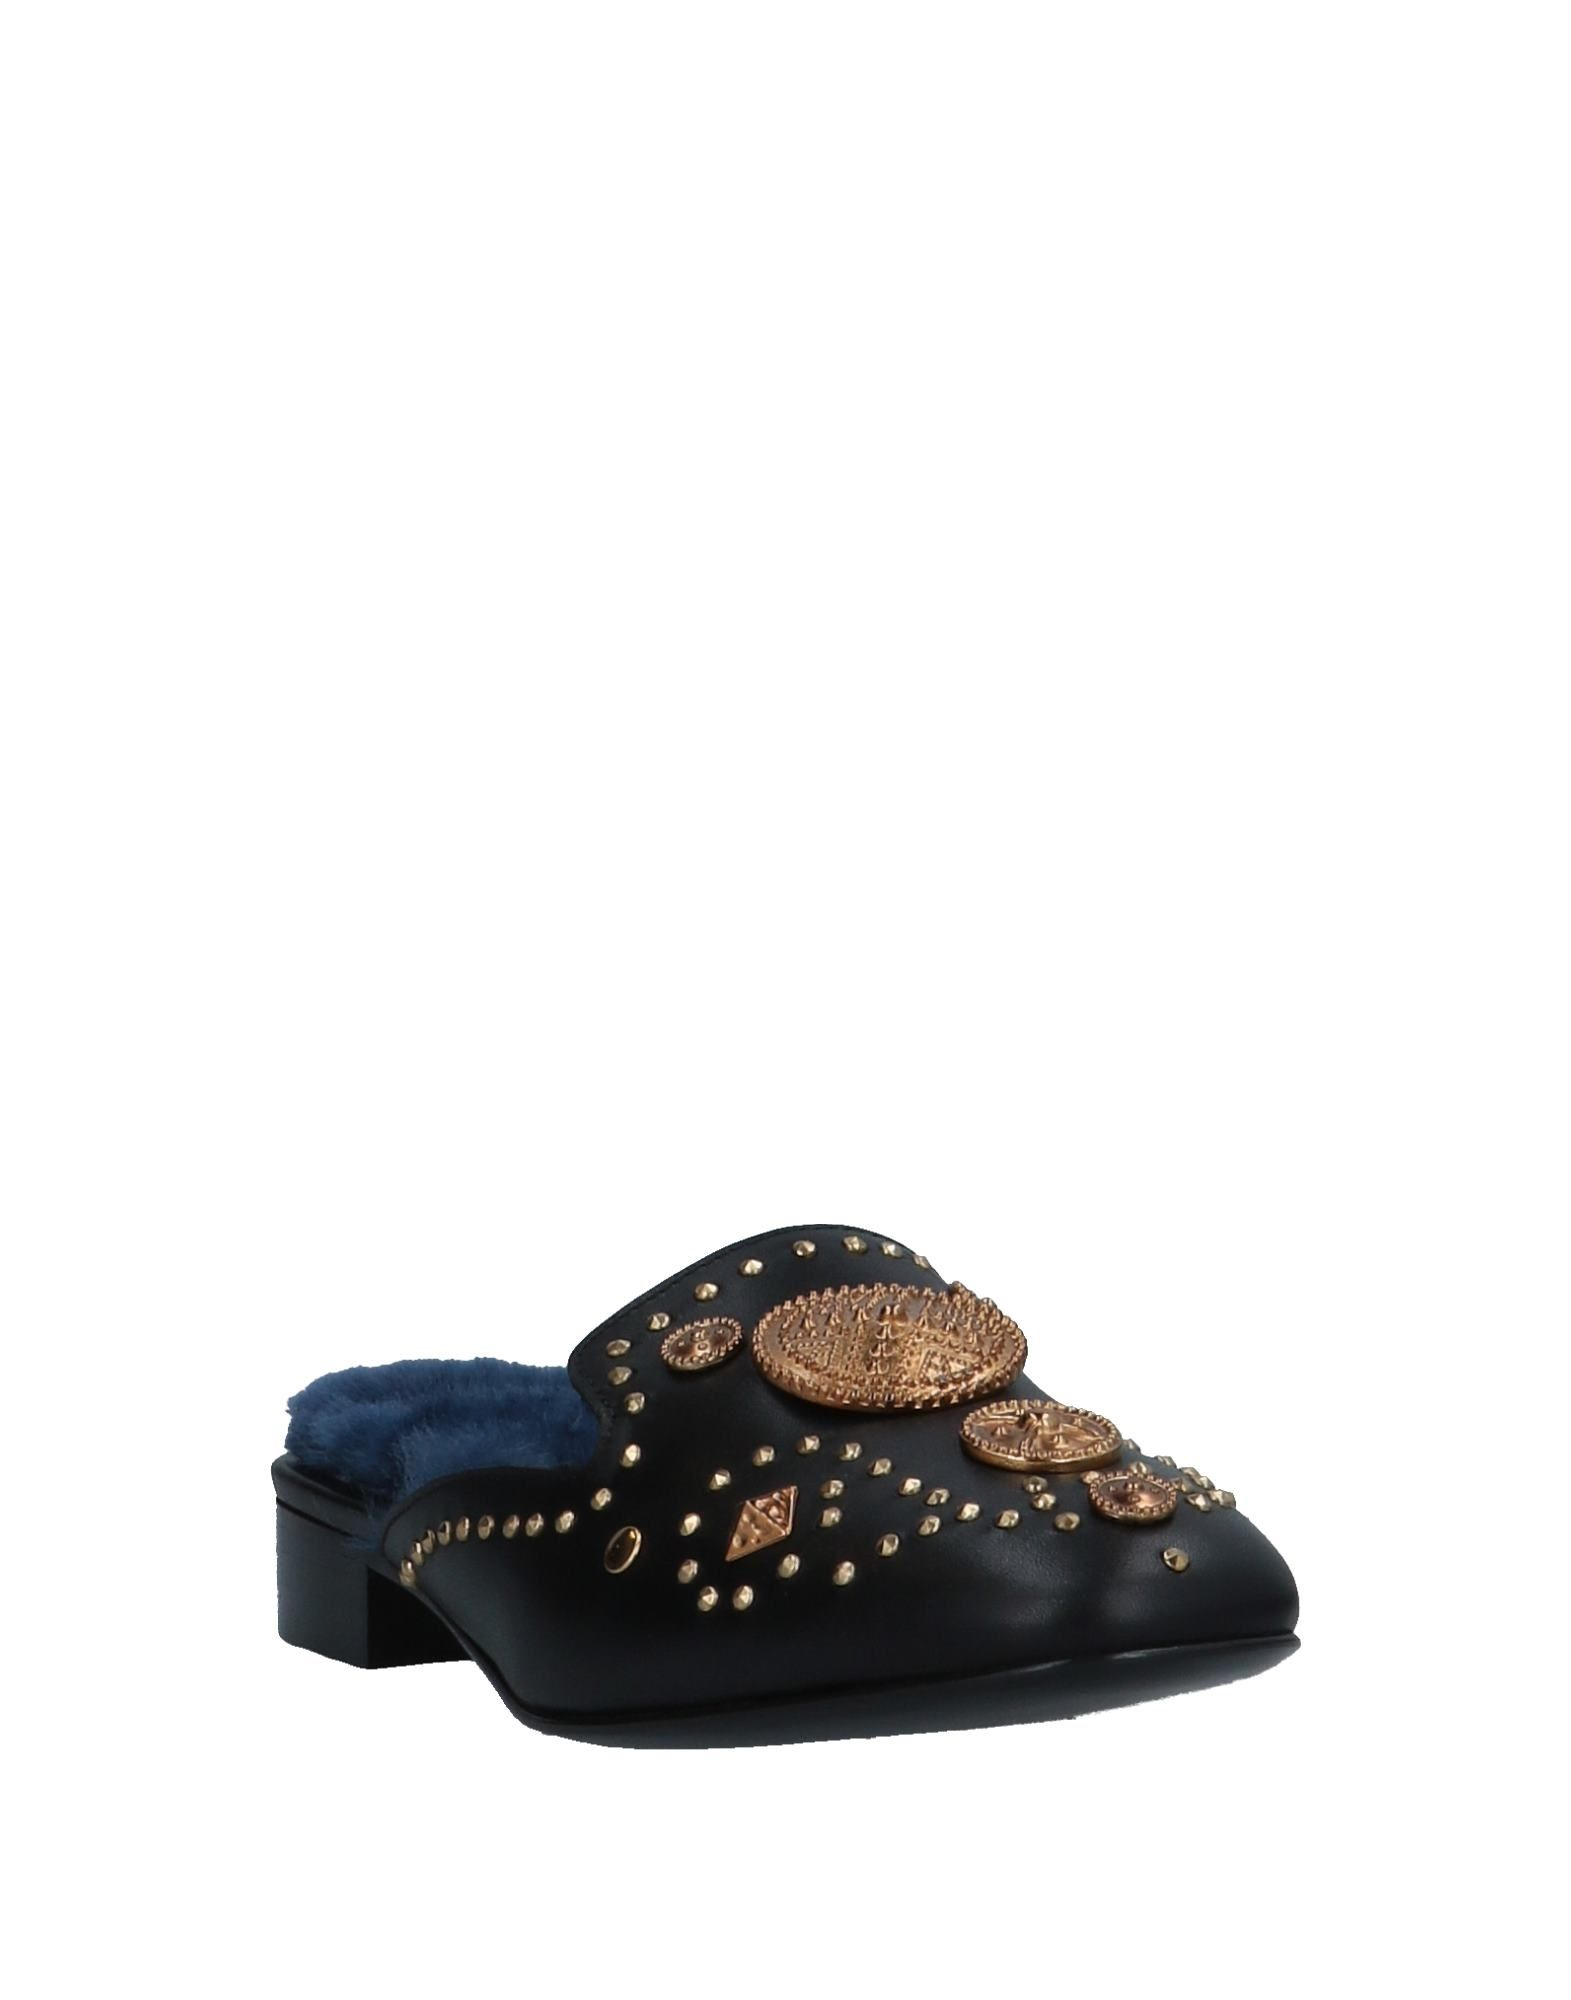 Fausto Puglisi Mokassins aussehende Damen  11508170BWGünstige gut aussehende Mokassins Schuhe 84dc3d